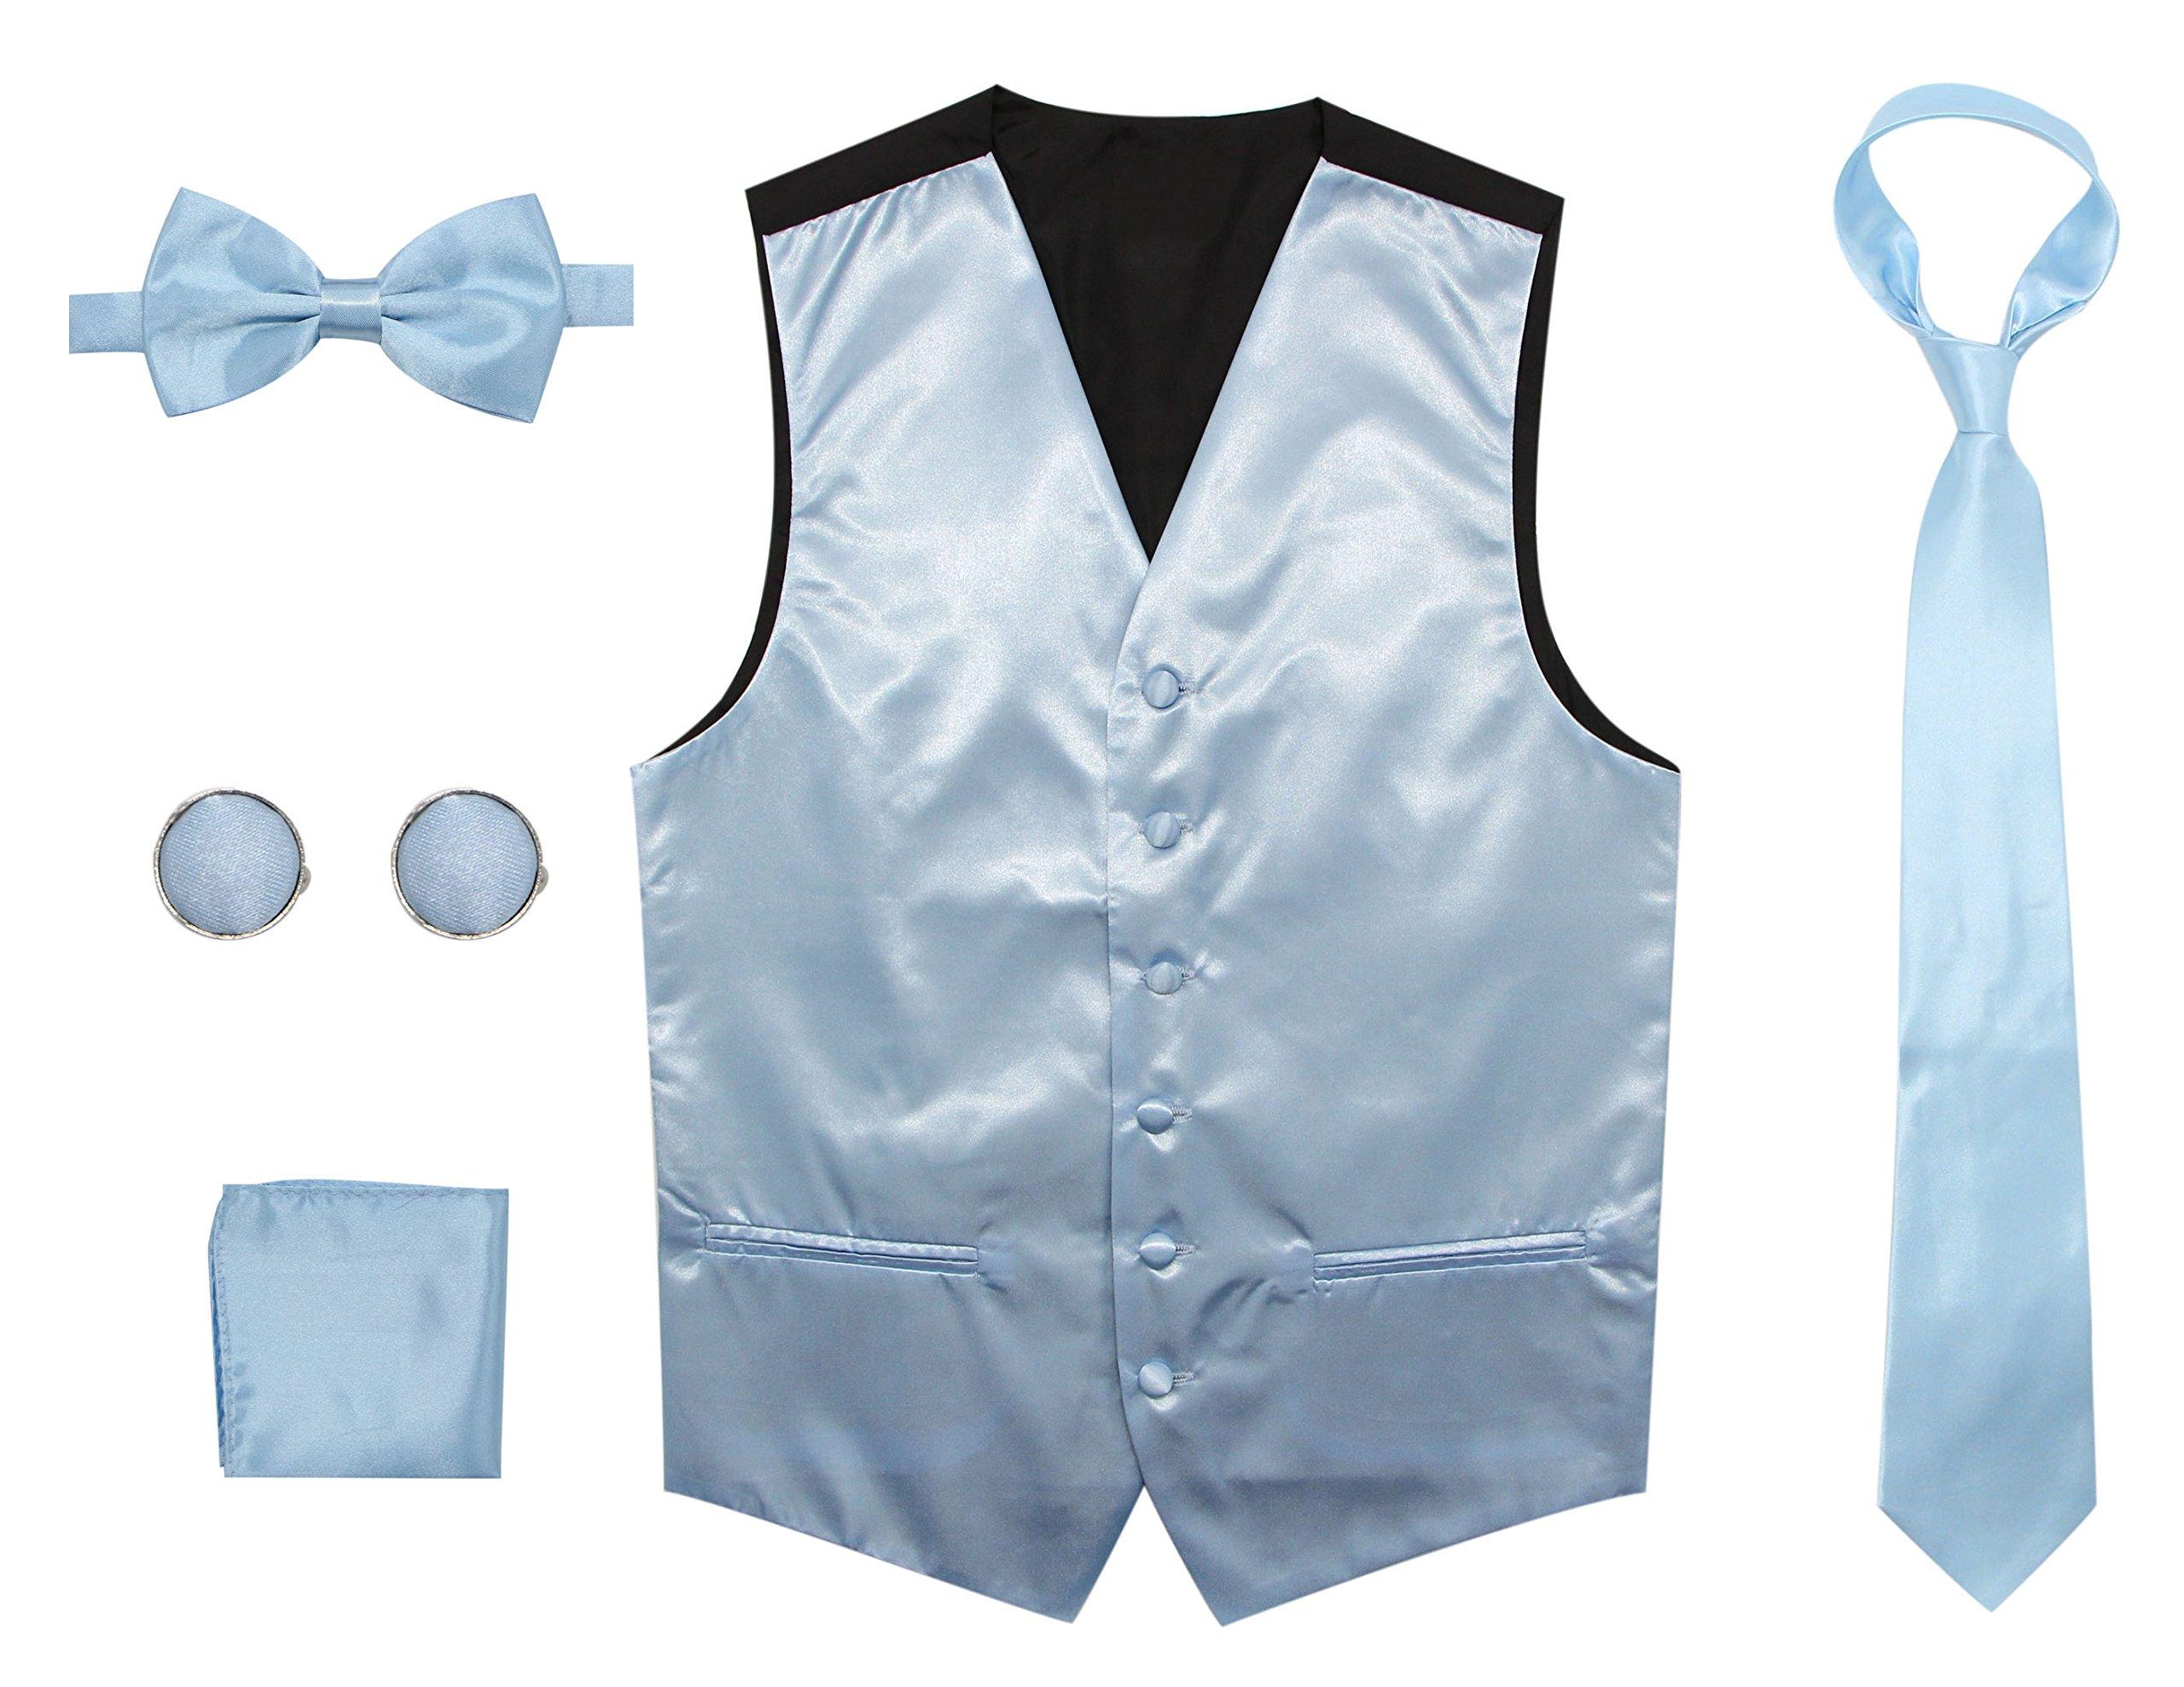 Bioterti Men's 5-Piece Vest Set: Vest + Necktie + Pre-Tied Bowtie+ Pocket Square + Pair Of Cufflinks (Large, Sky Blue)